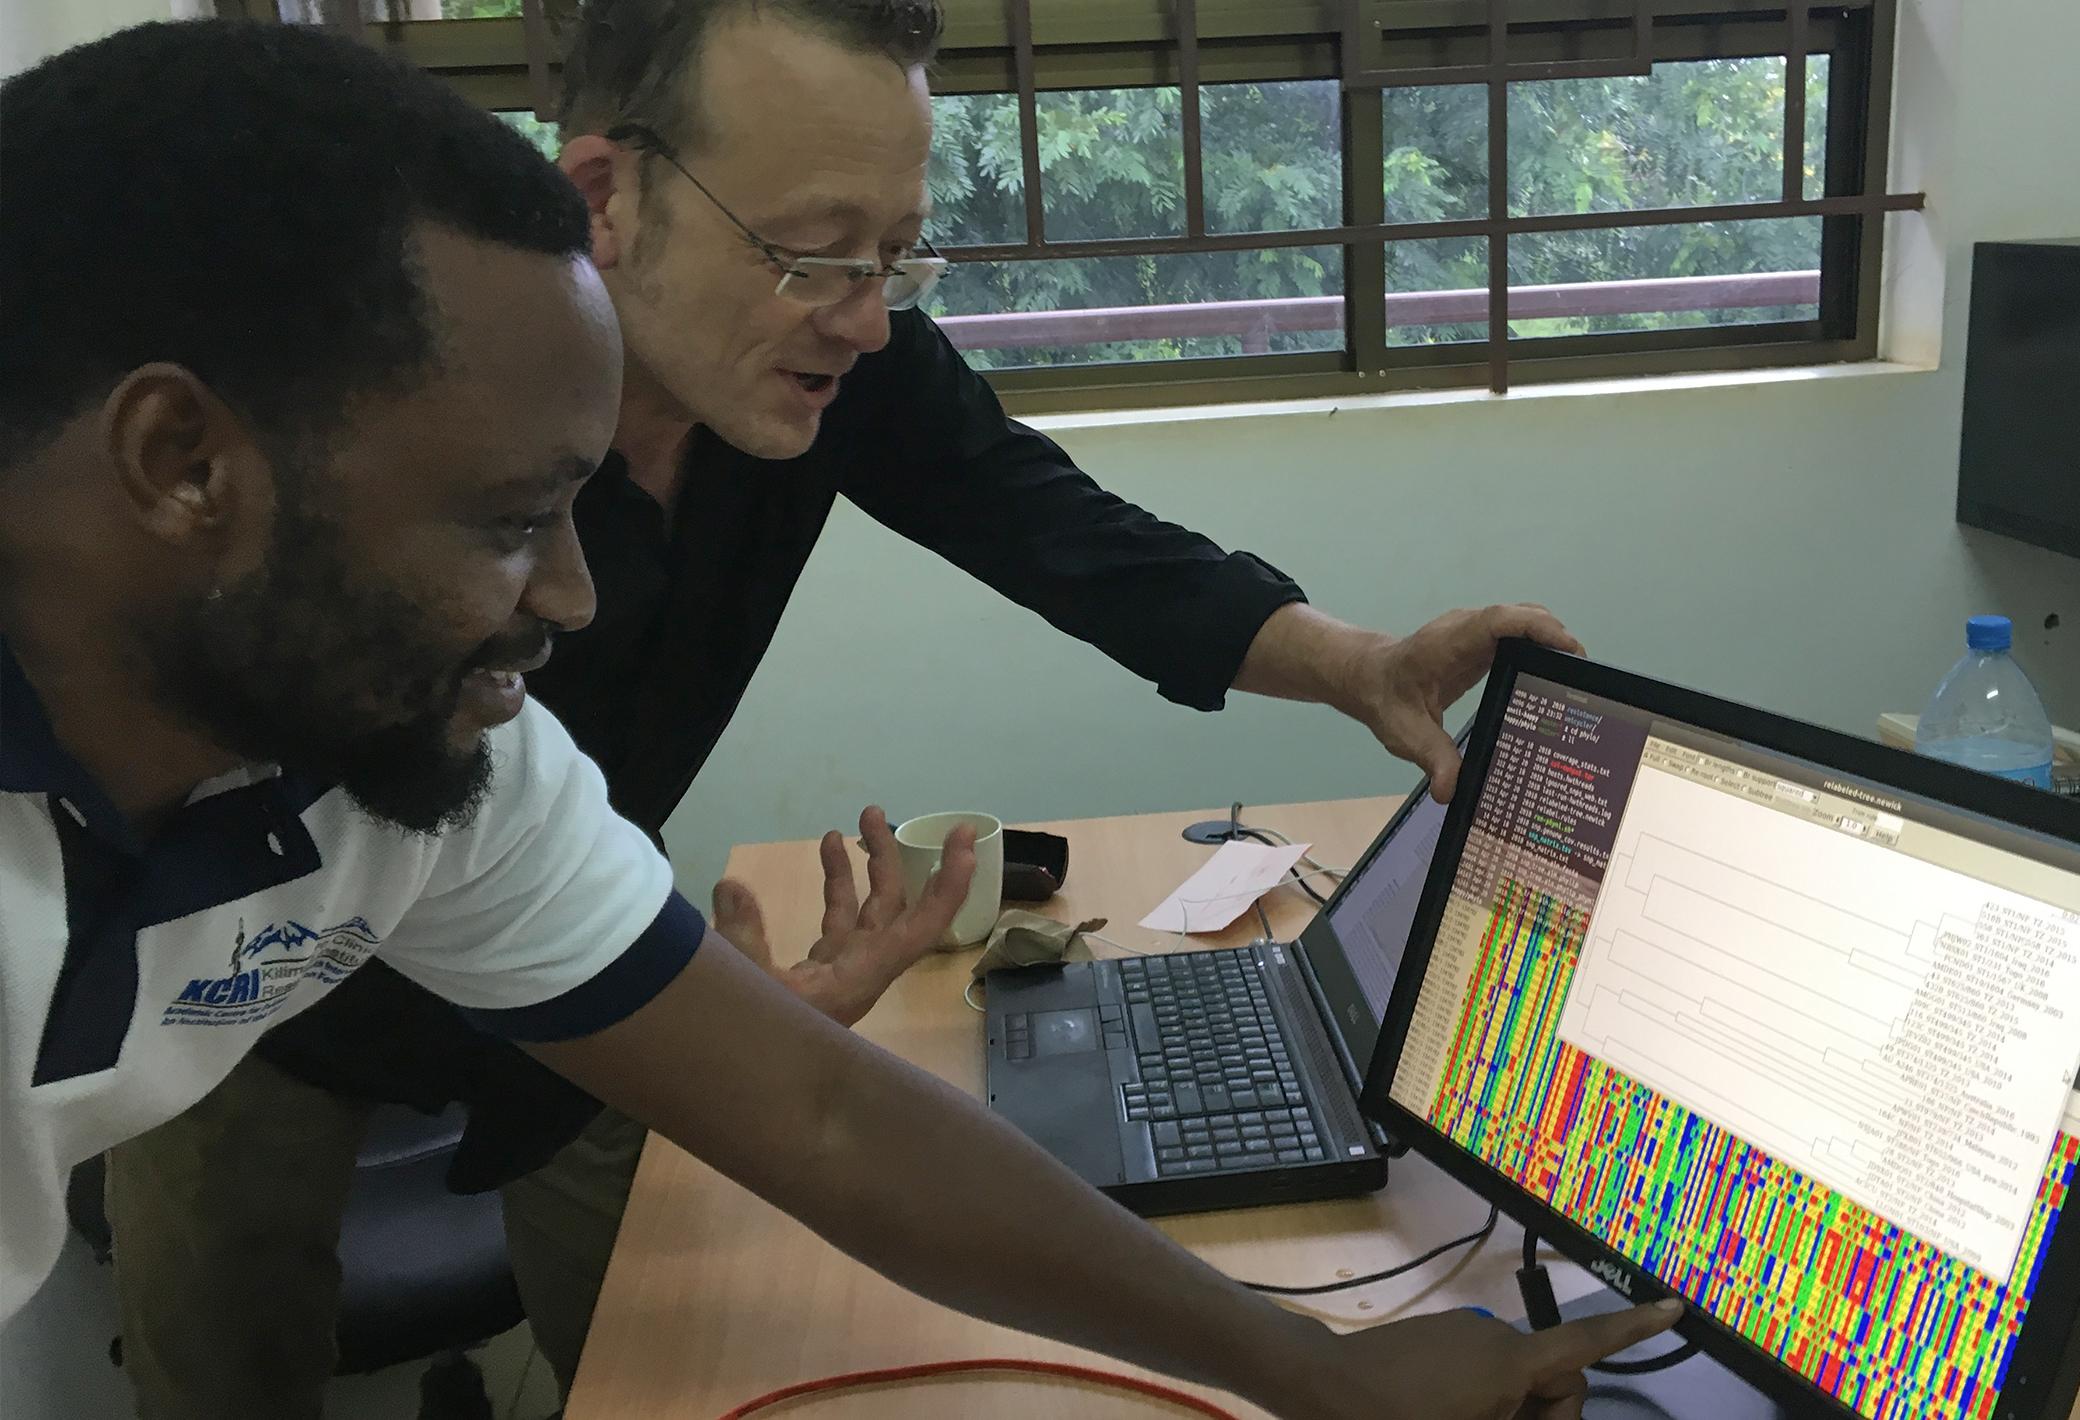 Sonda with Marco van Zwetselaar, studying whole genome sequencing data